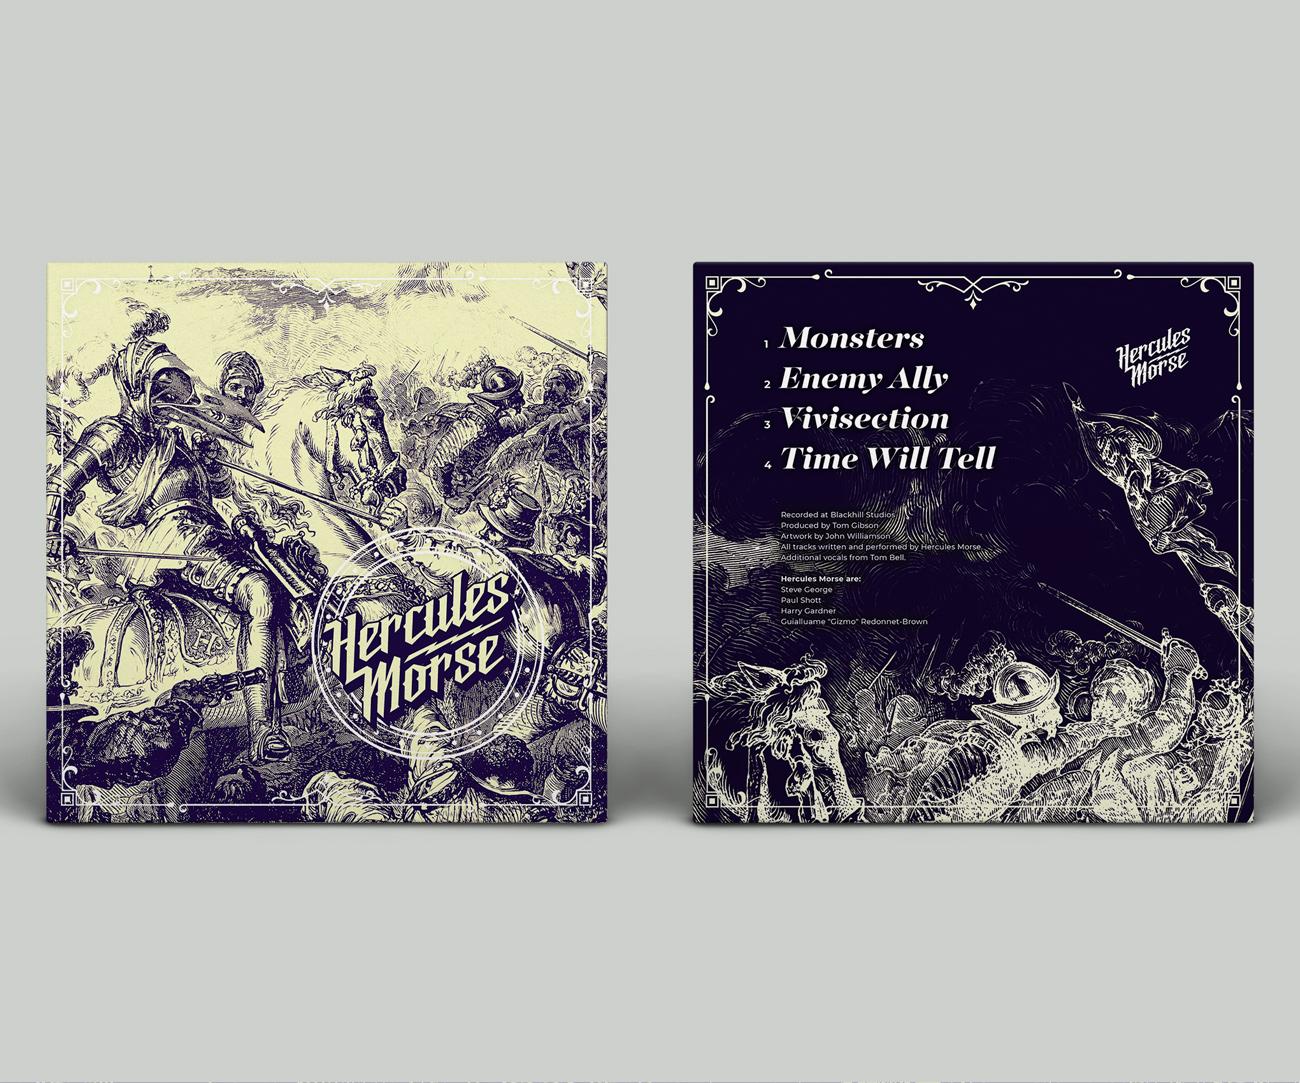 Hercules Morse Album Artwork Design